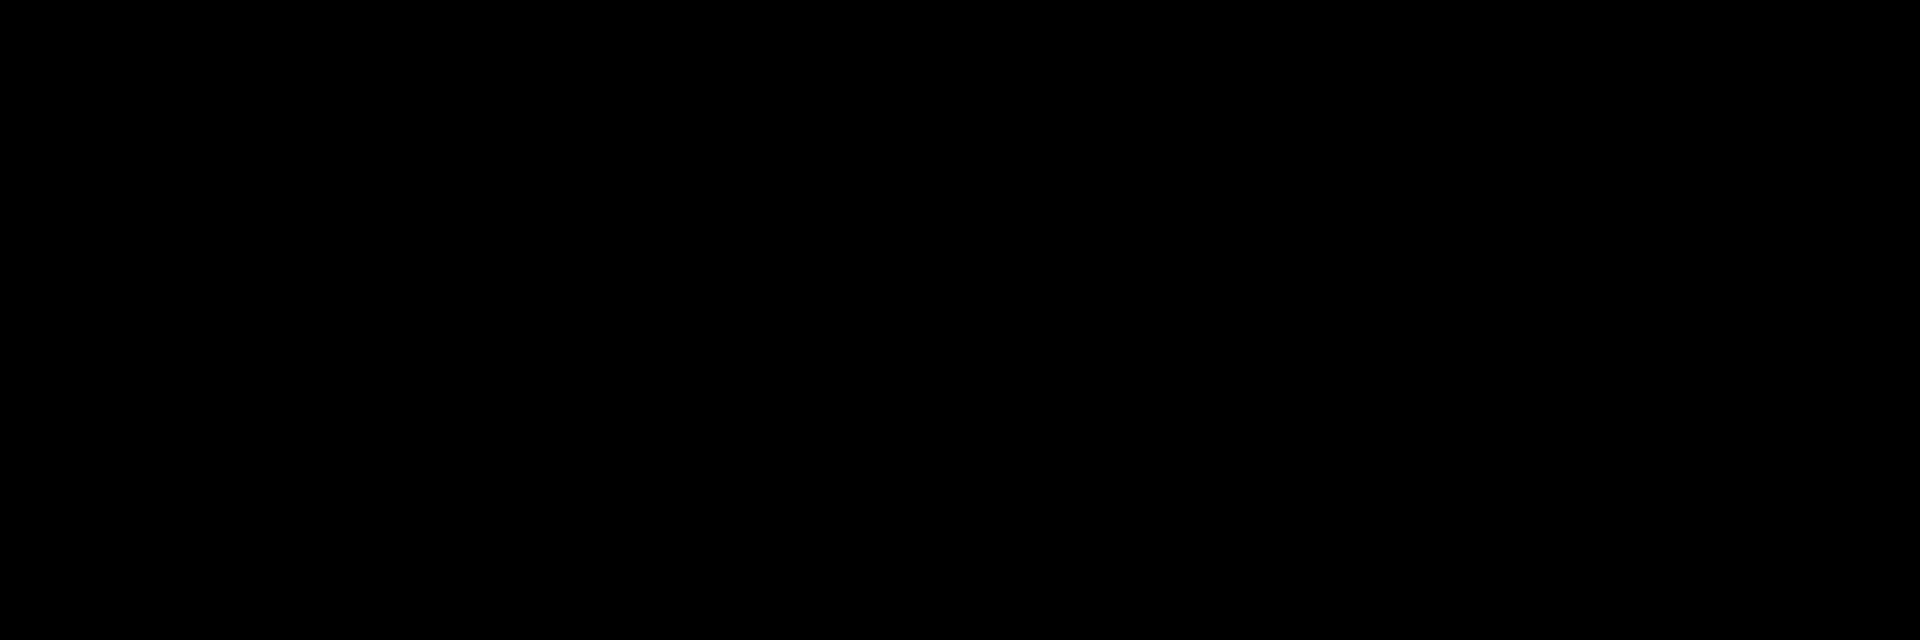 AQA CEO Colin Hughes Profile Signature